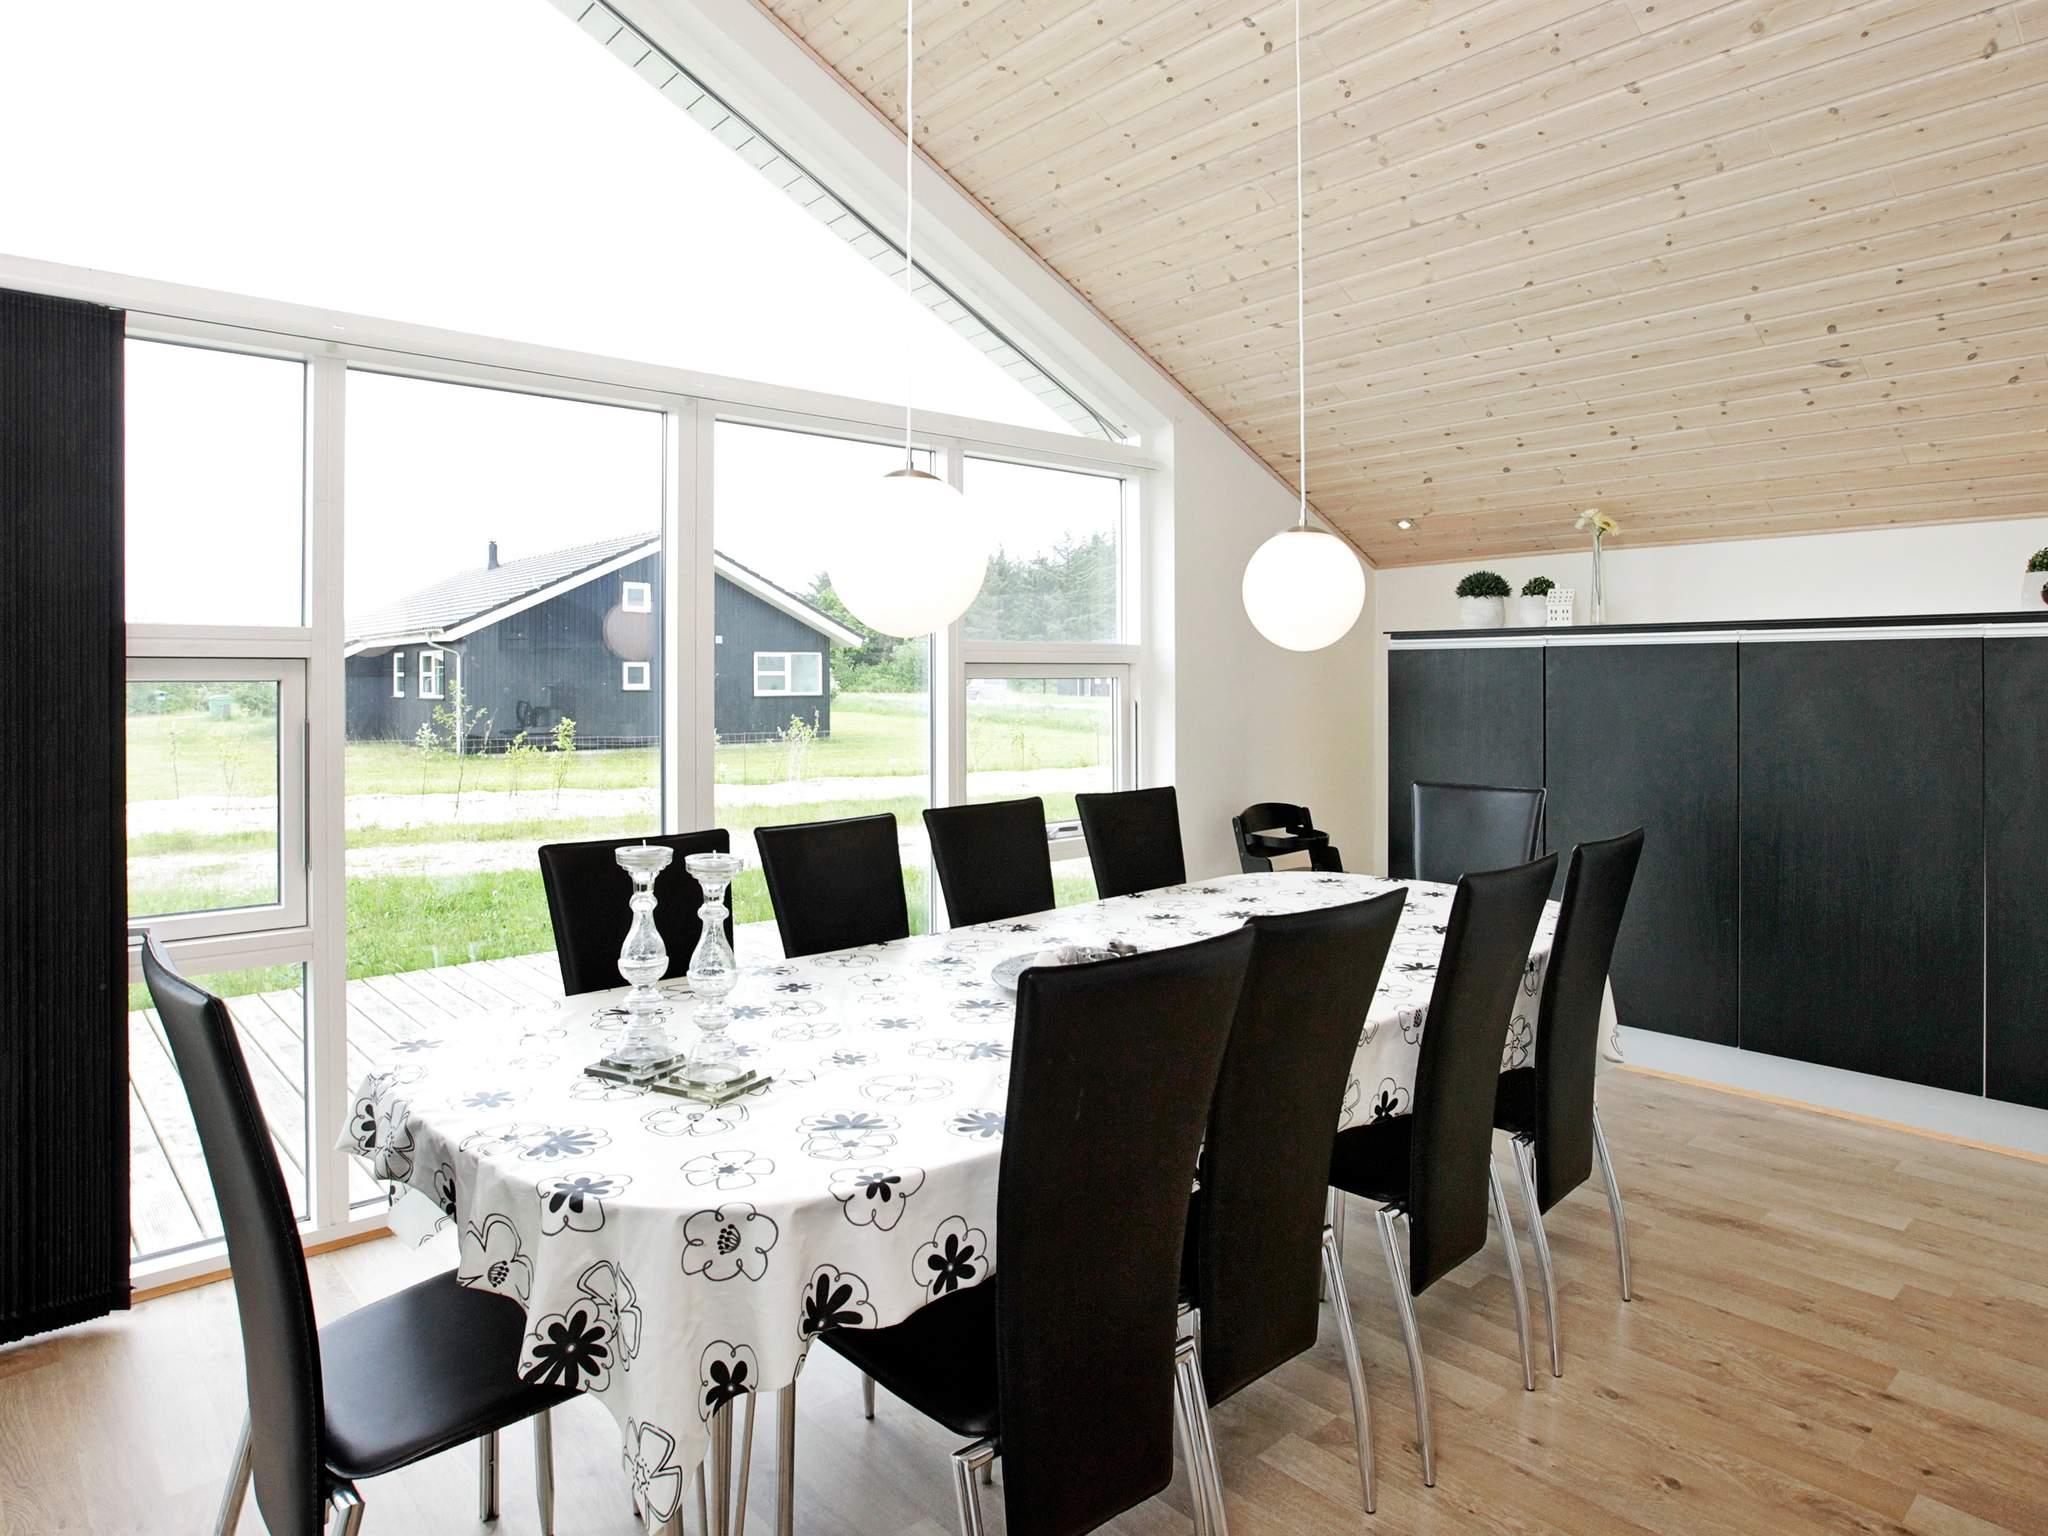 Ferienhaus Tranum Strand (379541), Tranum Enge, , Nordwestjütland, Dänemark, Bild 3